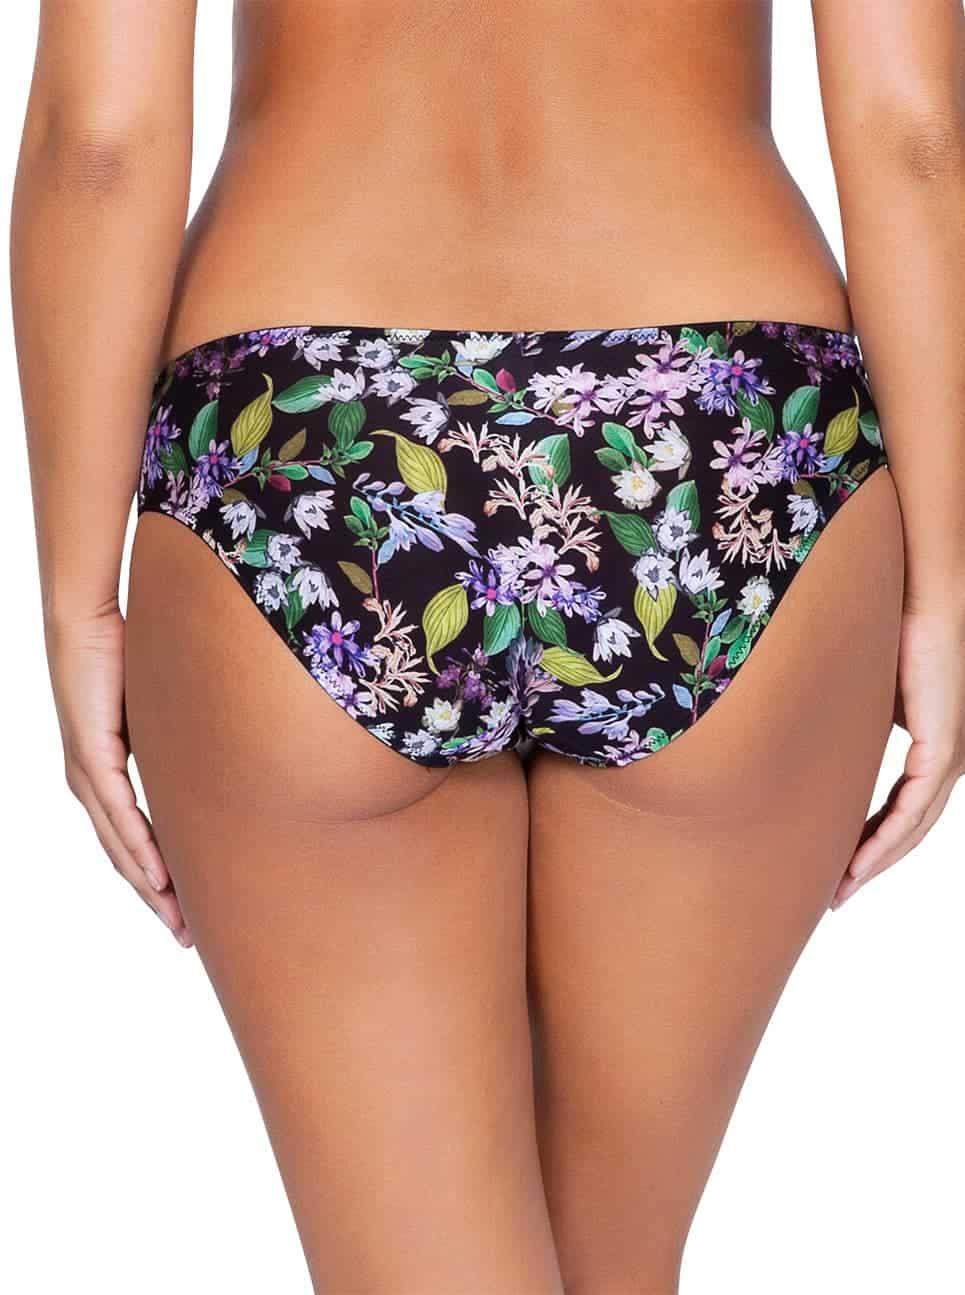 Ava P5373 Bikini Back - Ava Bikini - Black Floral - P5373